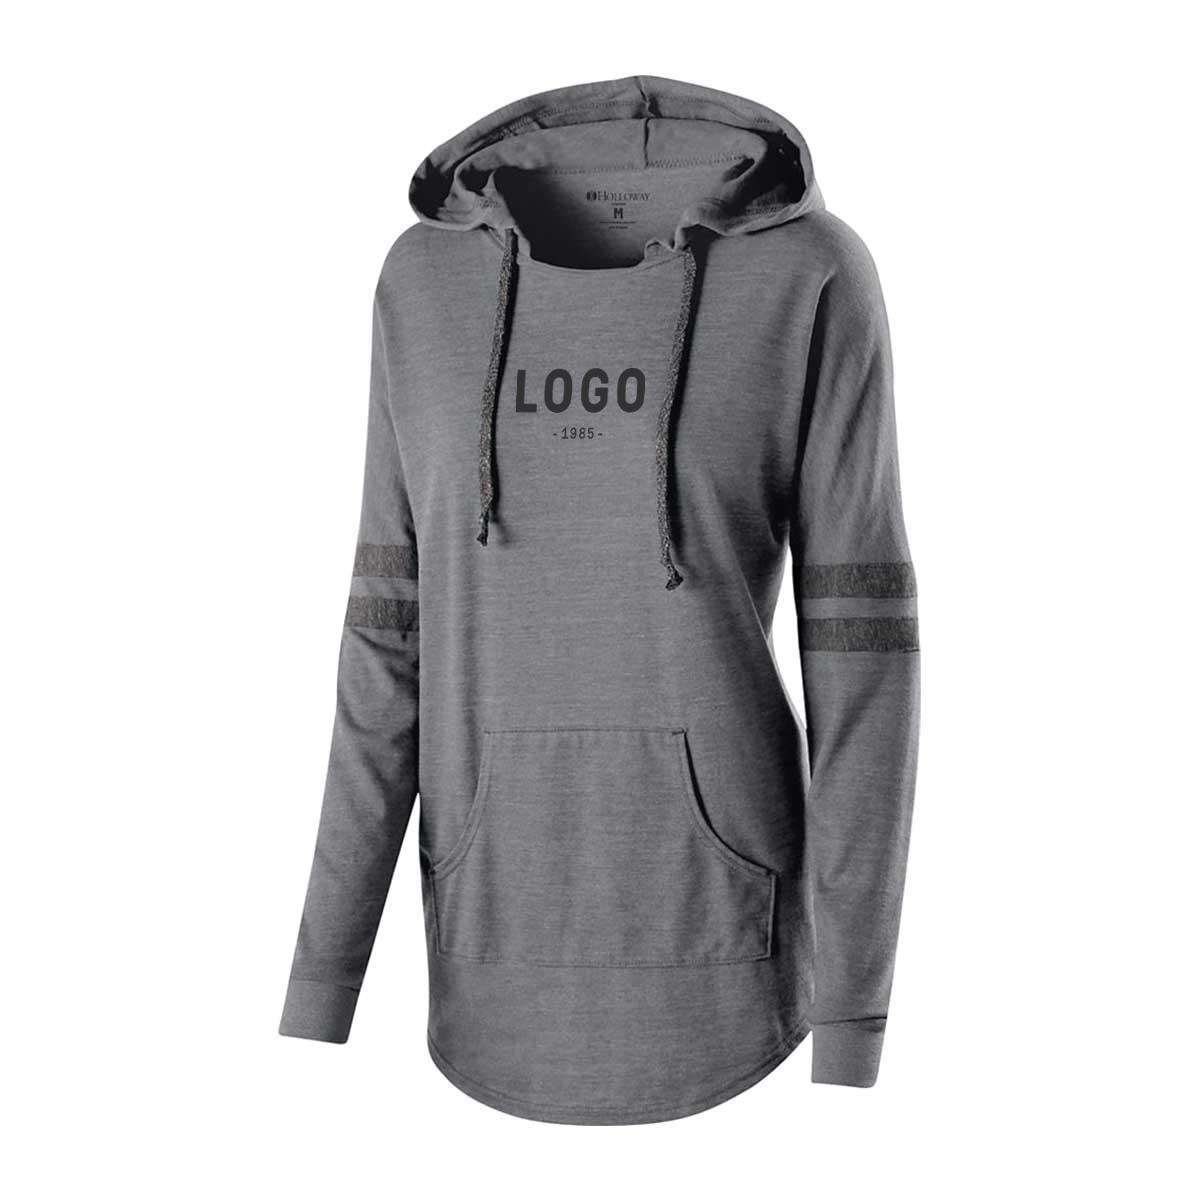 122725 ladies heather game day sweatshirt one color one location imprint